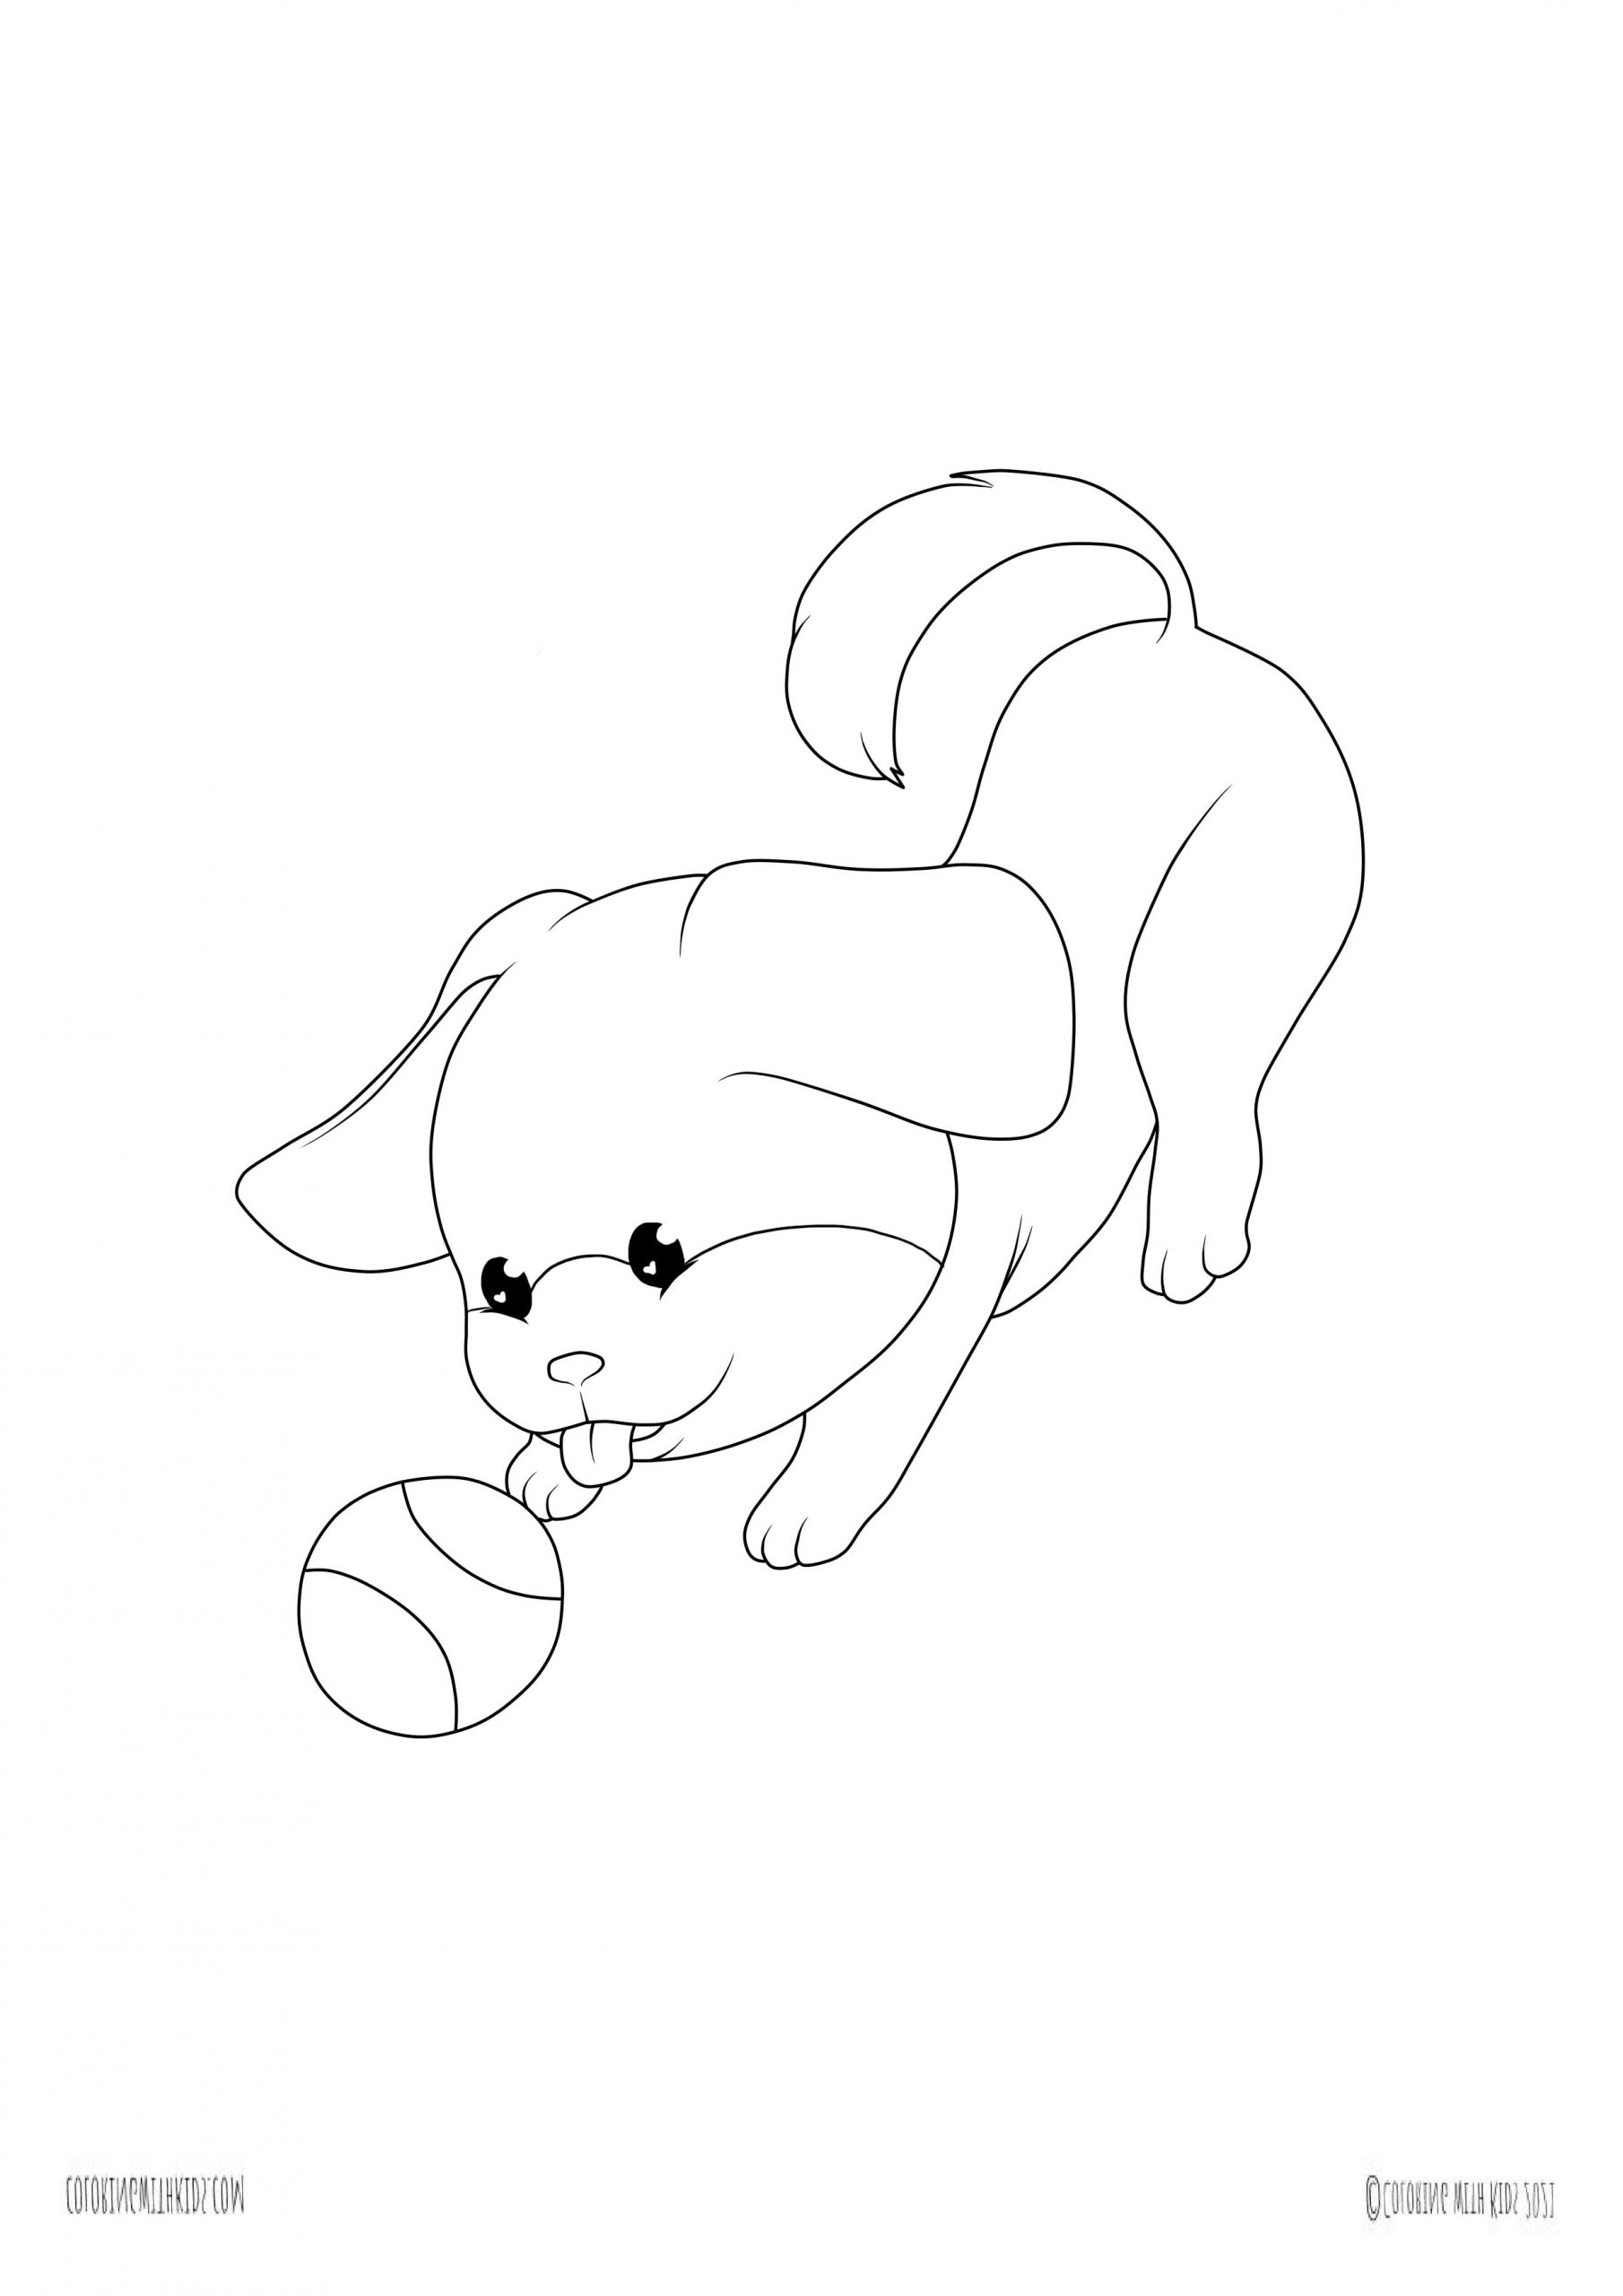 Kawaii puppy coloring page